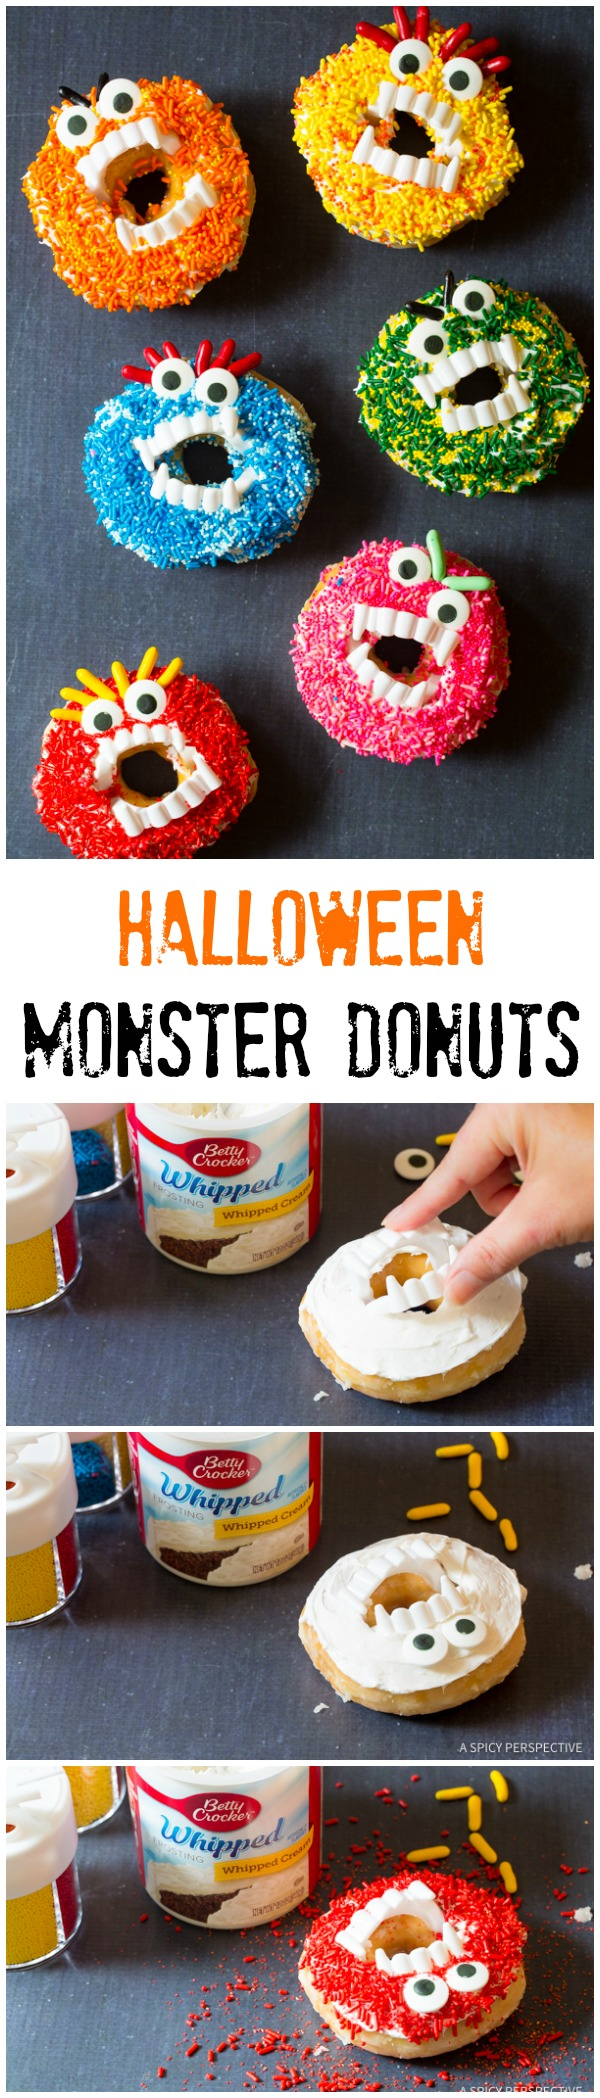 Kid-Friendly Halloween Monster Donuts | ASpicyPerspective.com